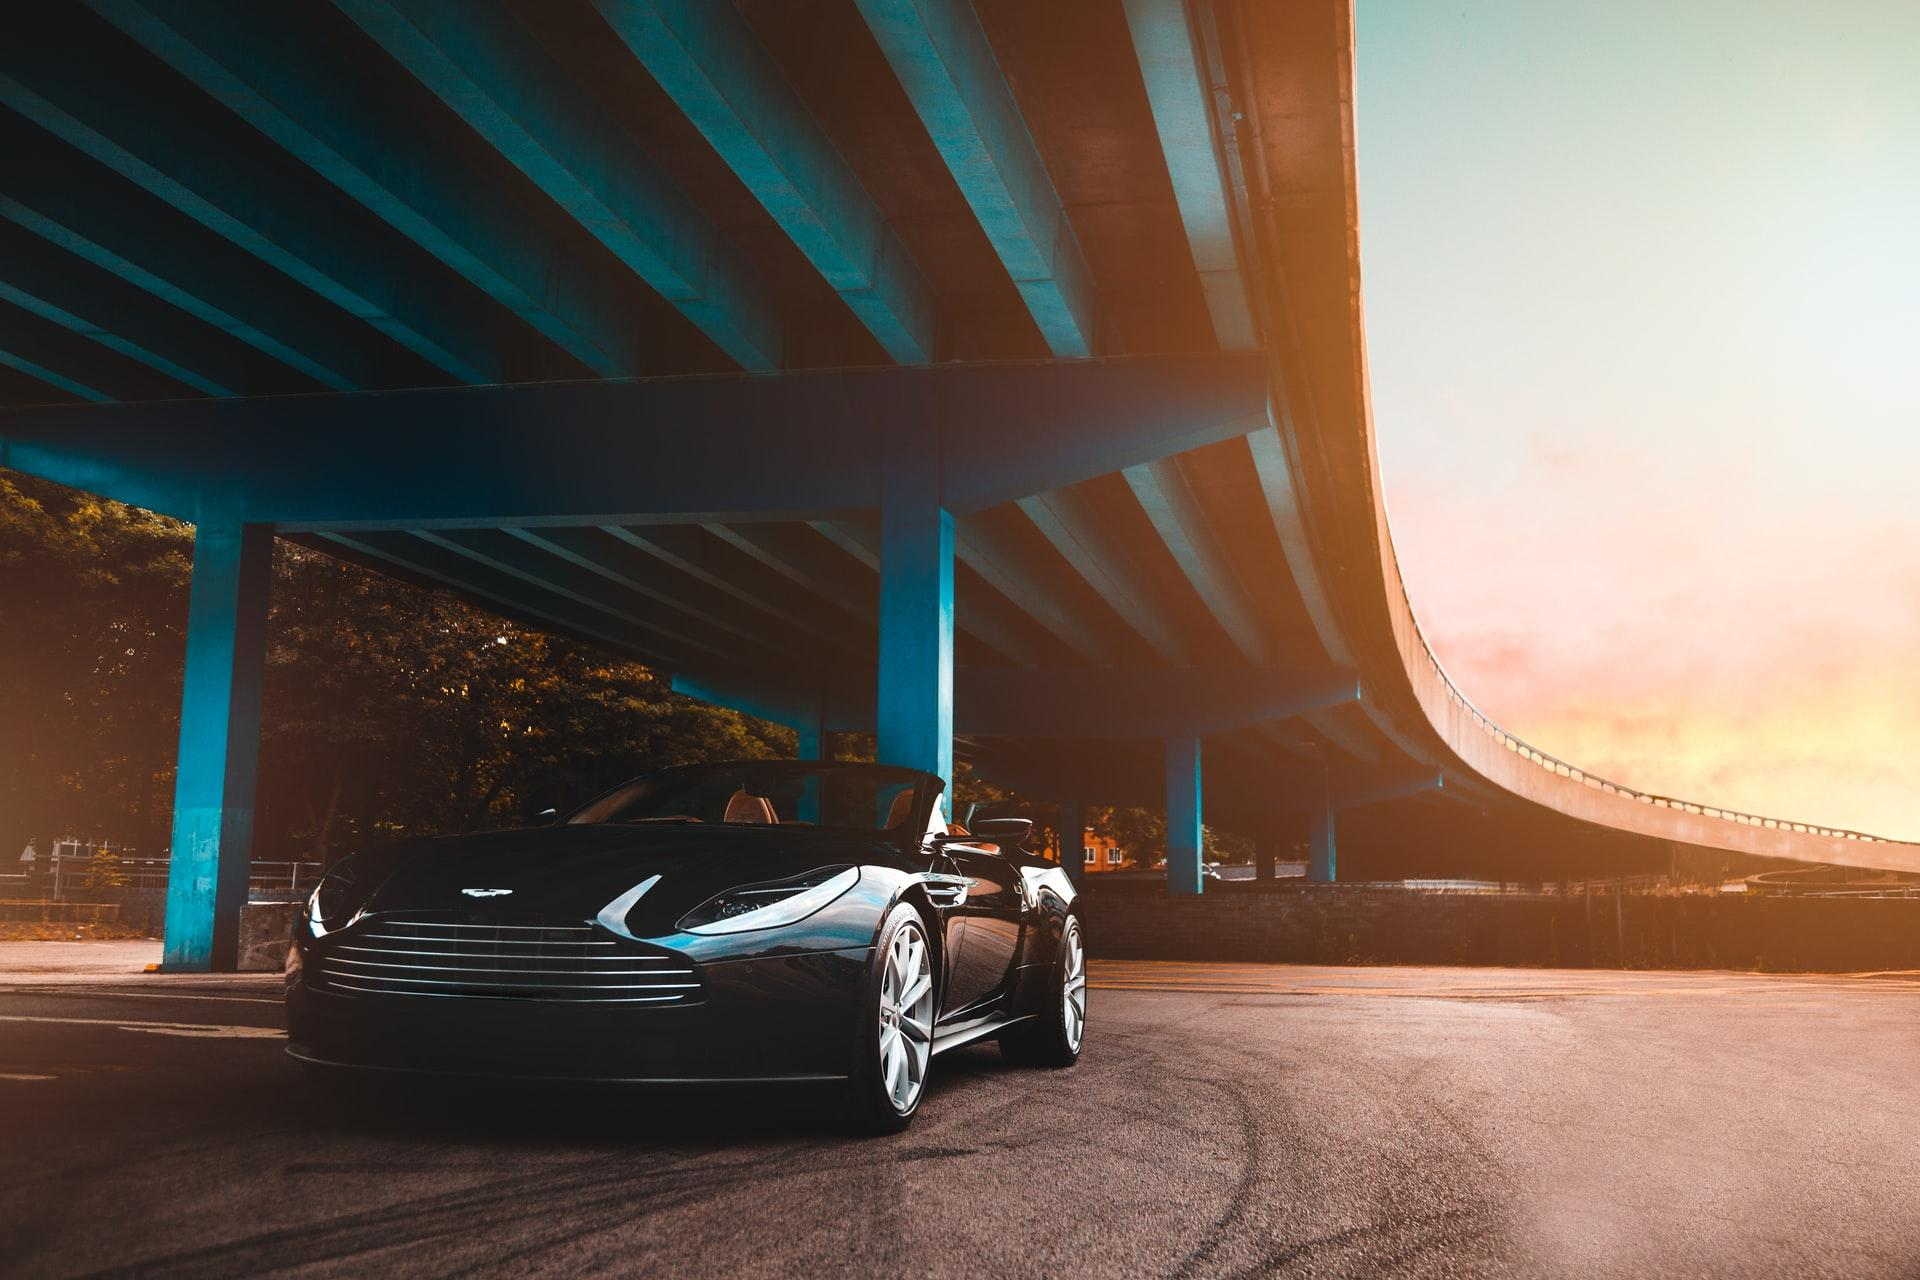 a-car-under-bridge